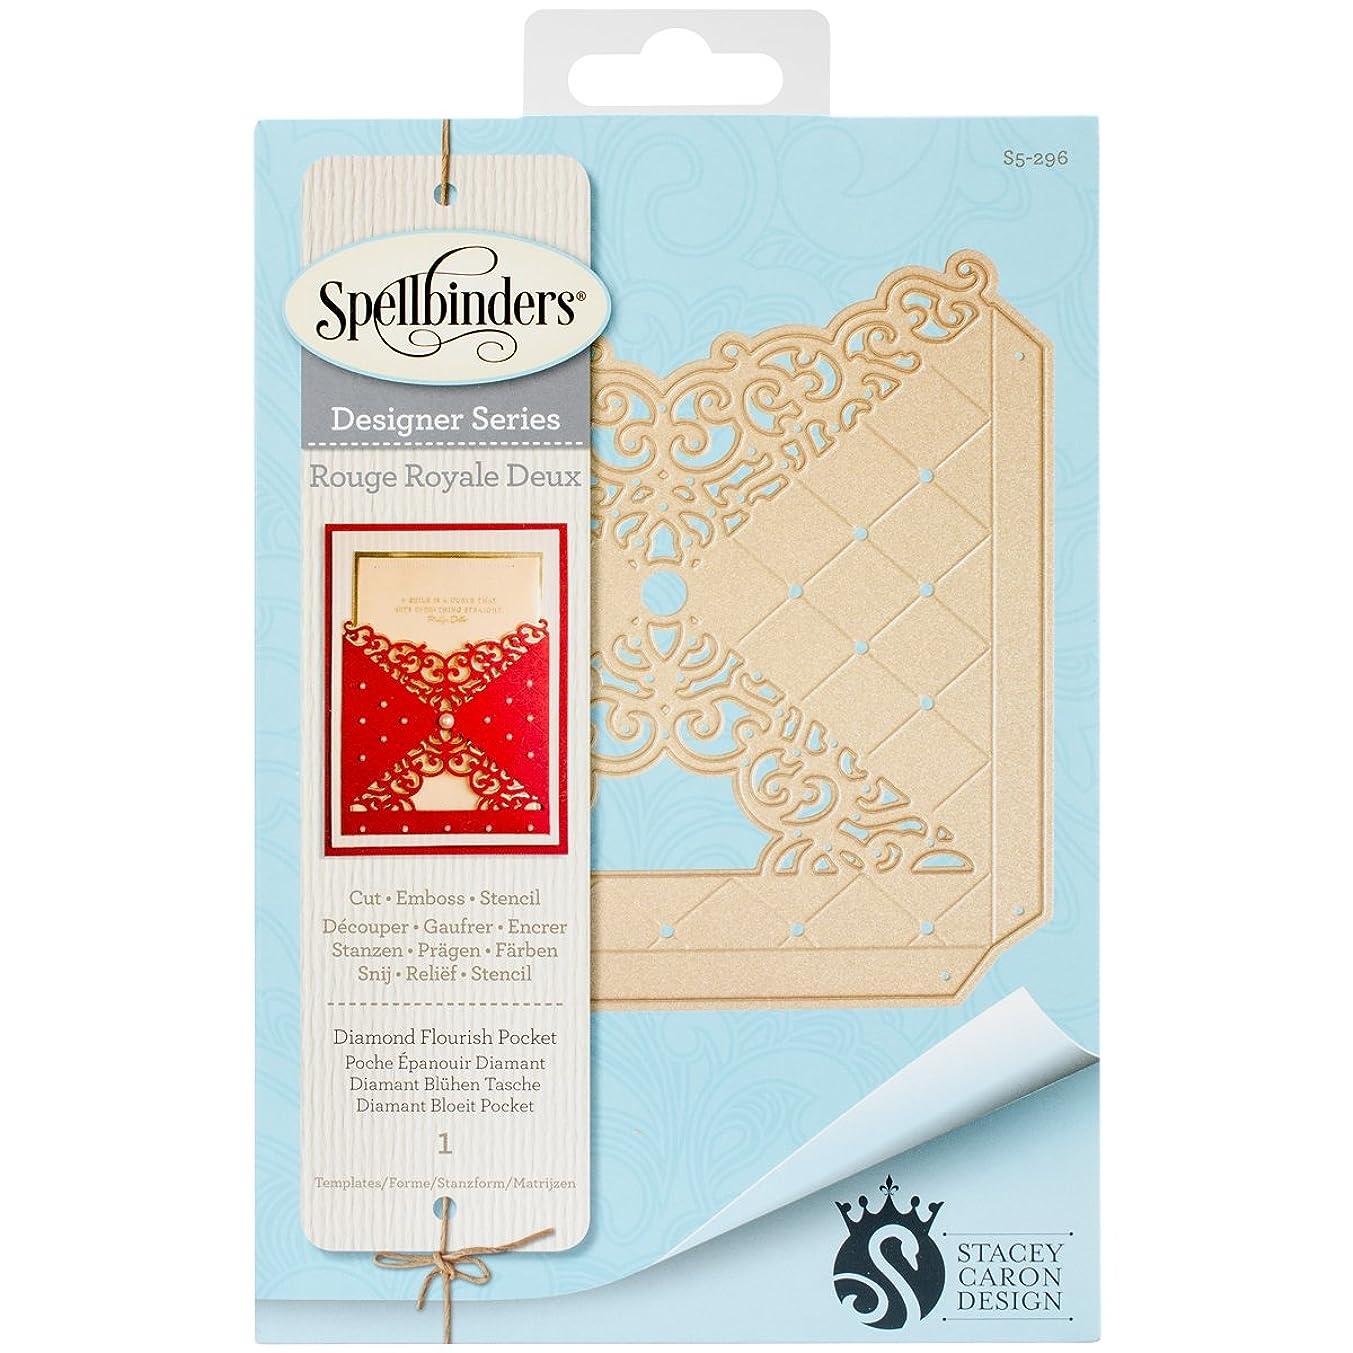 Spellbinders Diamond Flourish Pocket Etched/Wafer Thin Dies